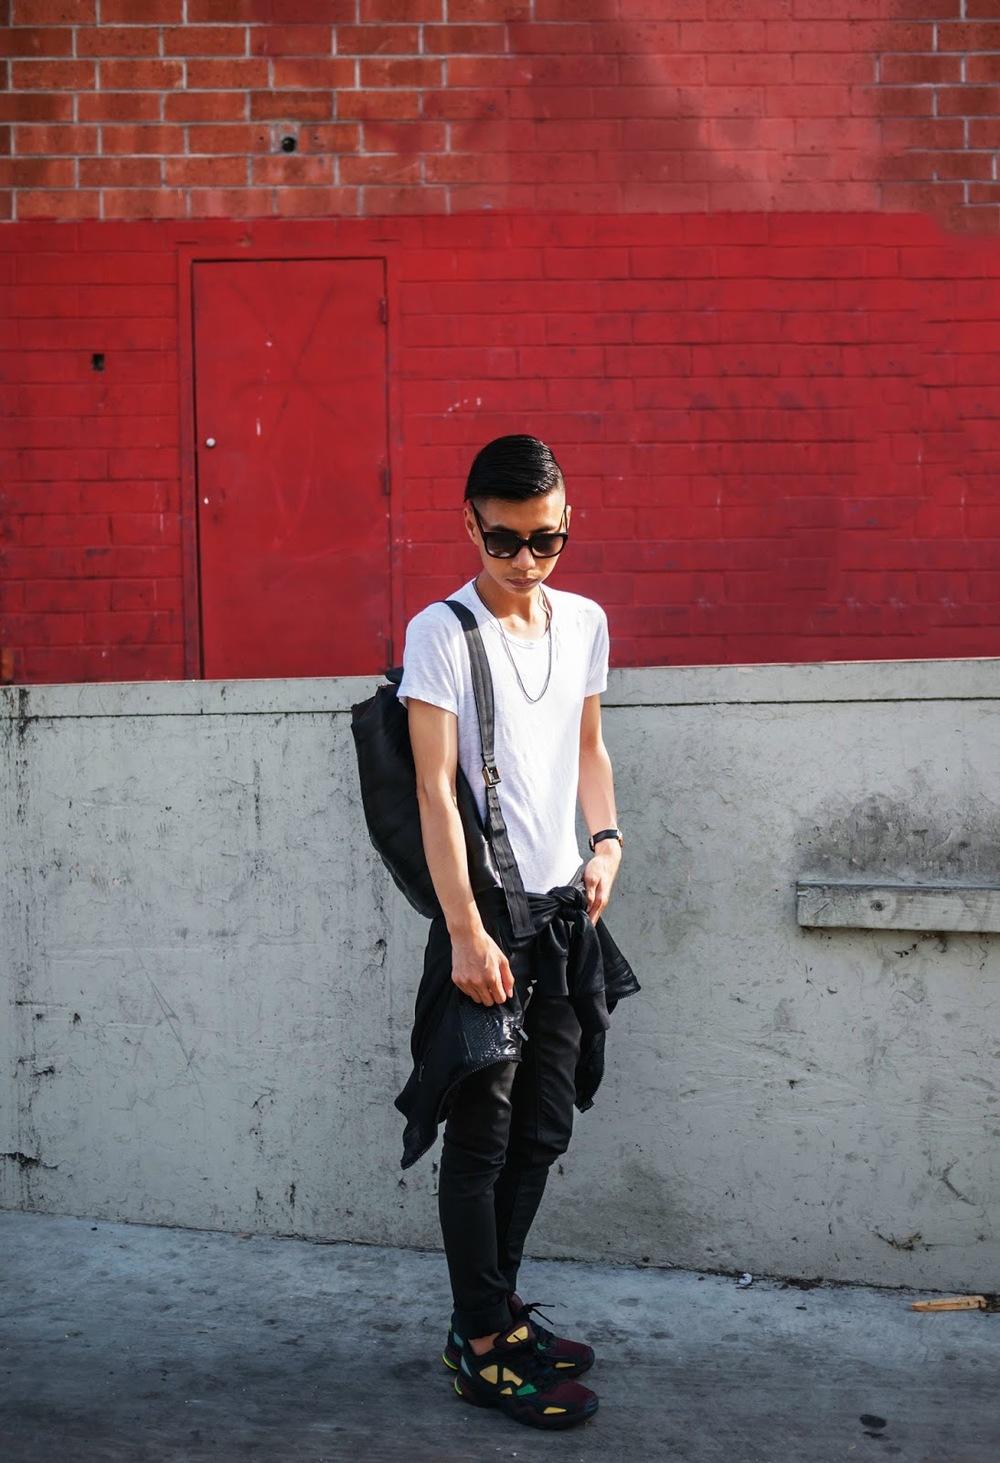 mybelonging-tommylei-menswearblogger-streetstyle-kaopaoshu-adidas-rafsimons-warbyparker-1-copy.jpg